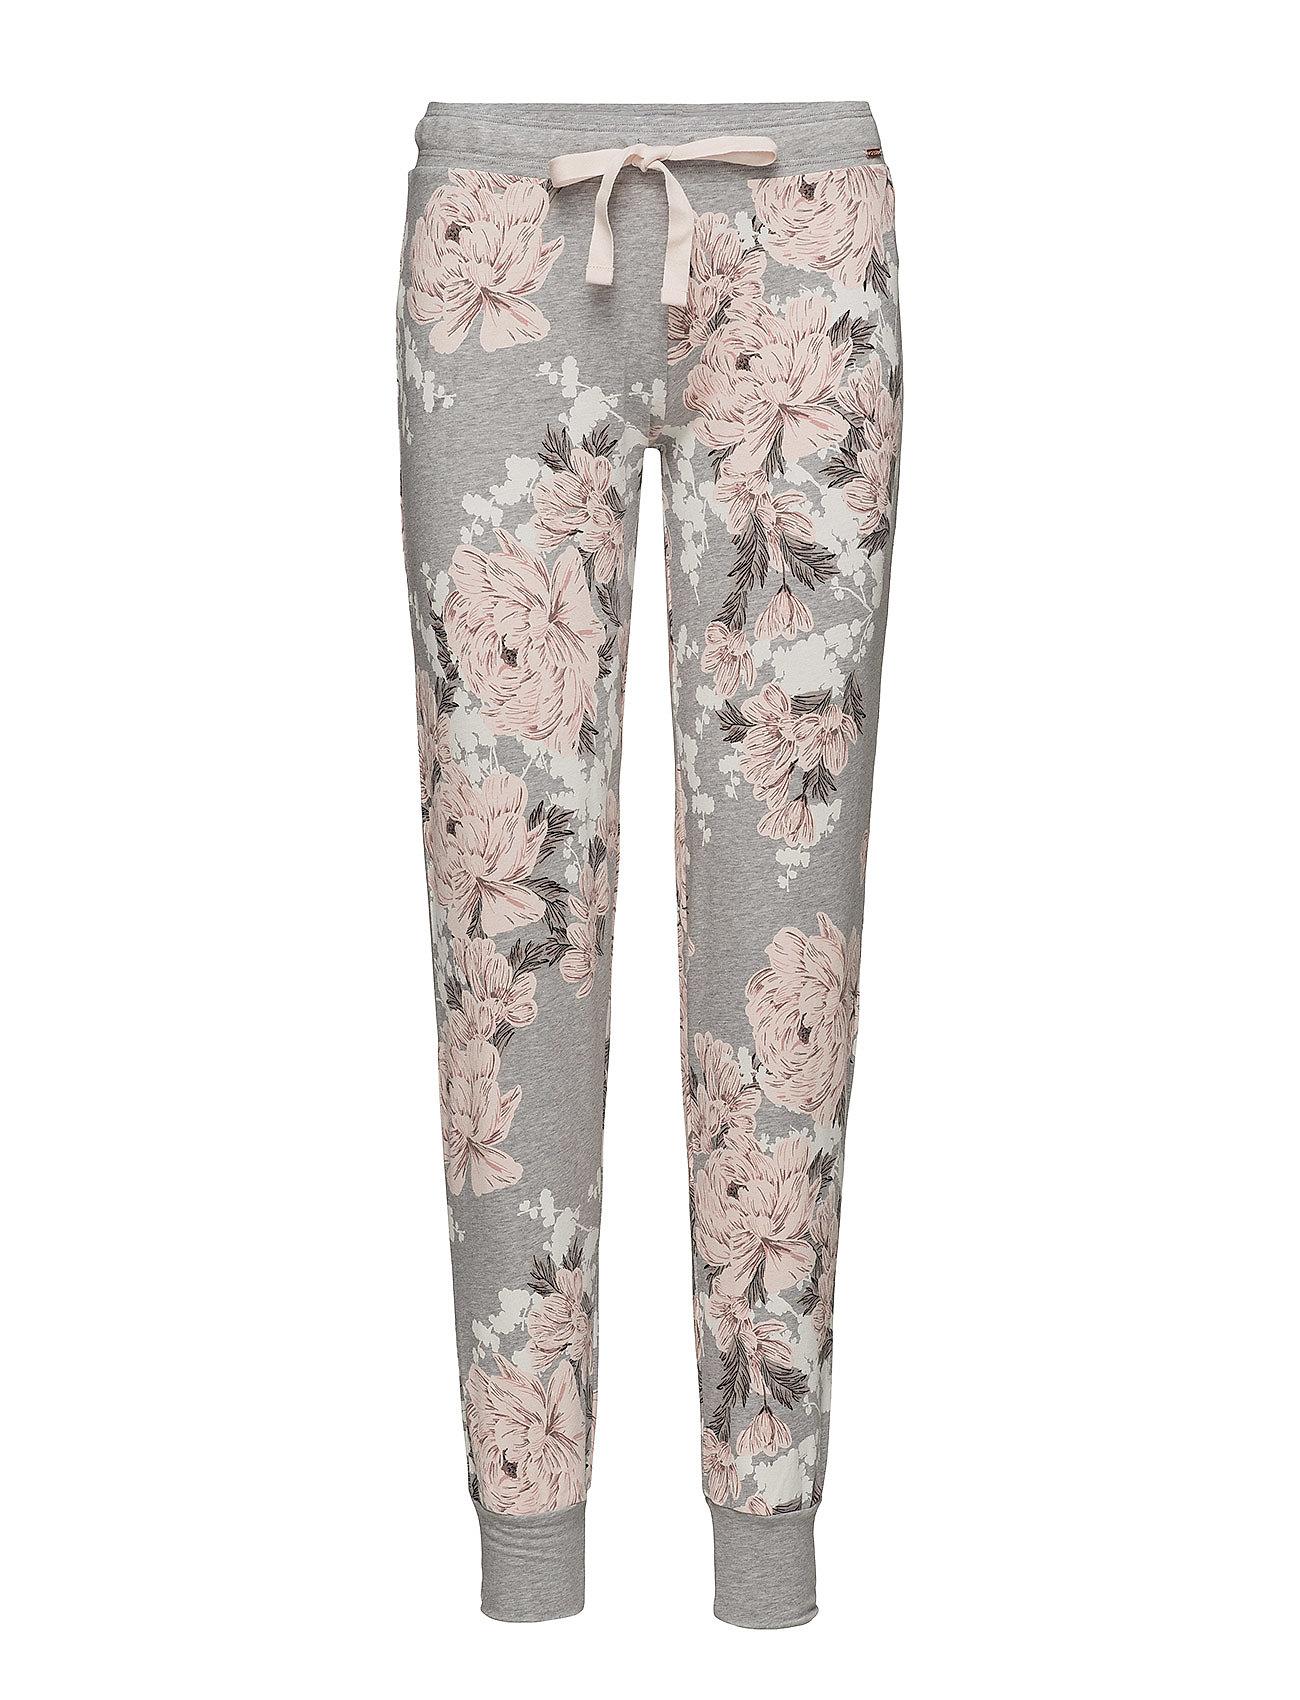 Skiny L. pants long - MELANGE FLOWER